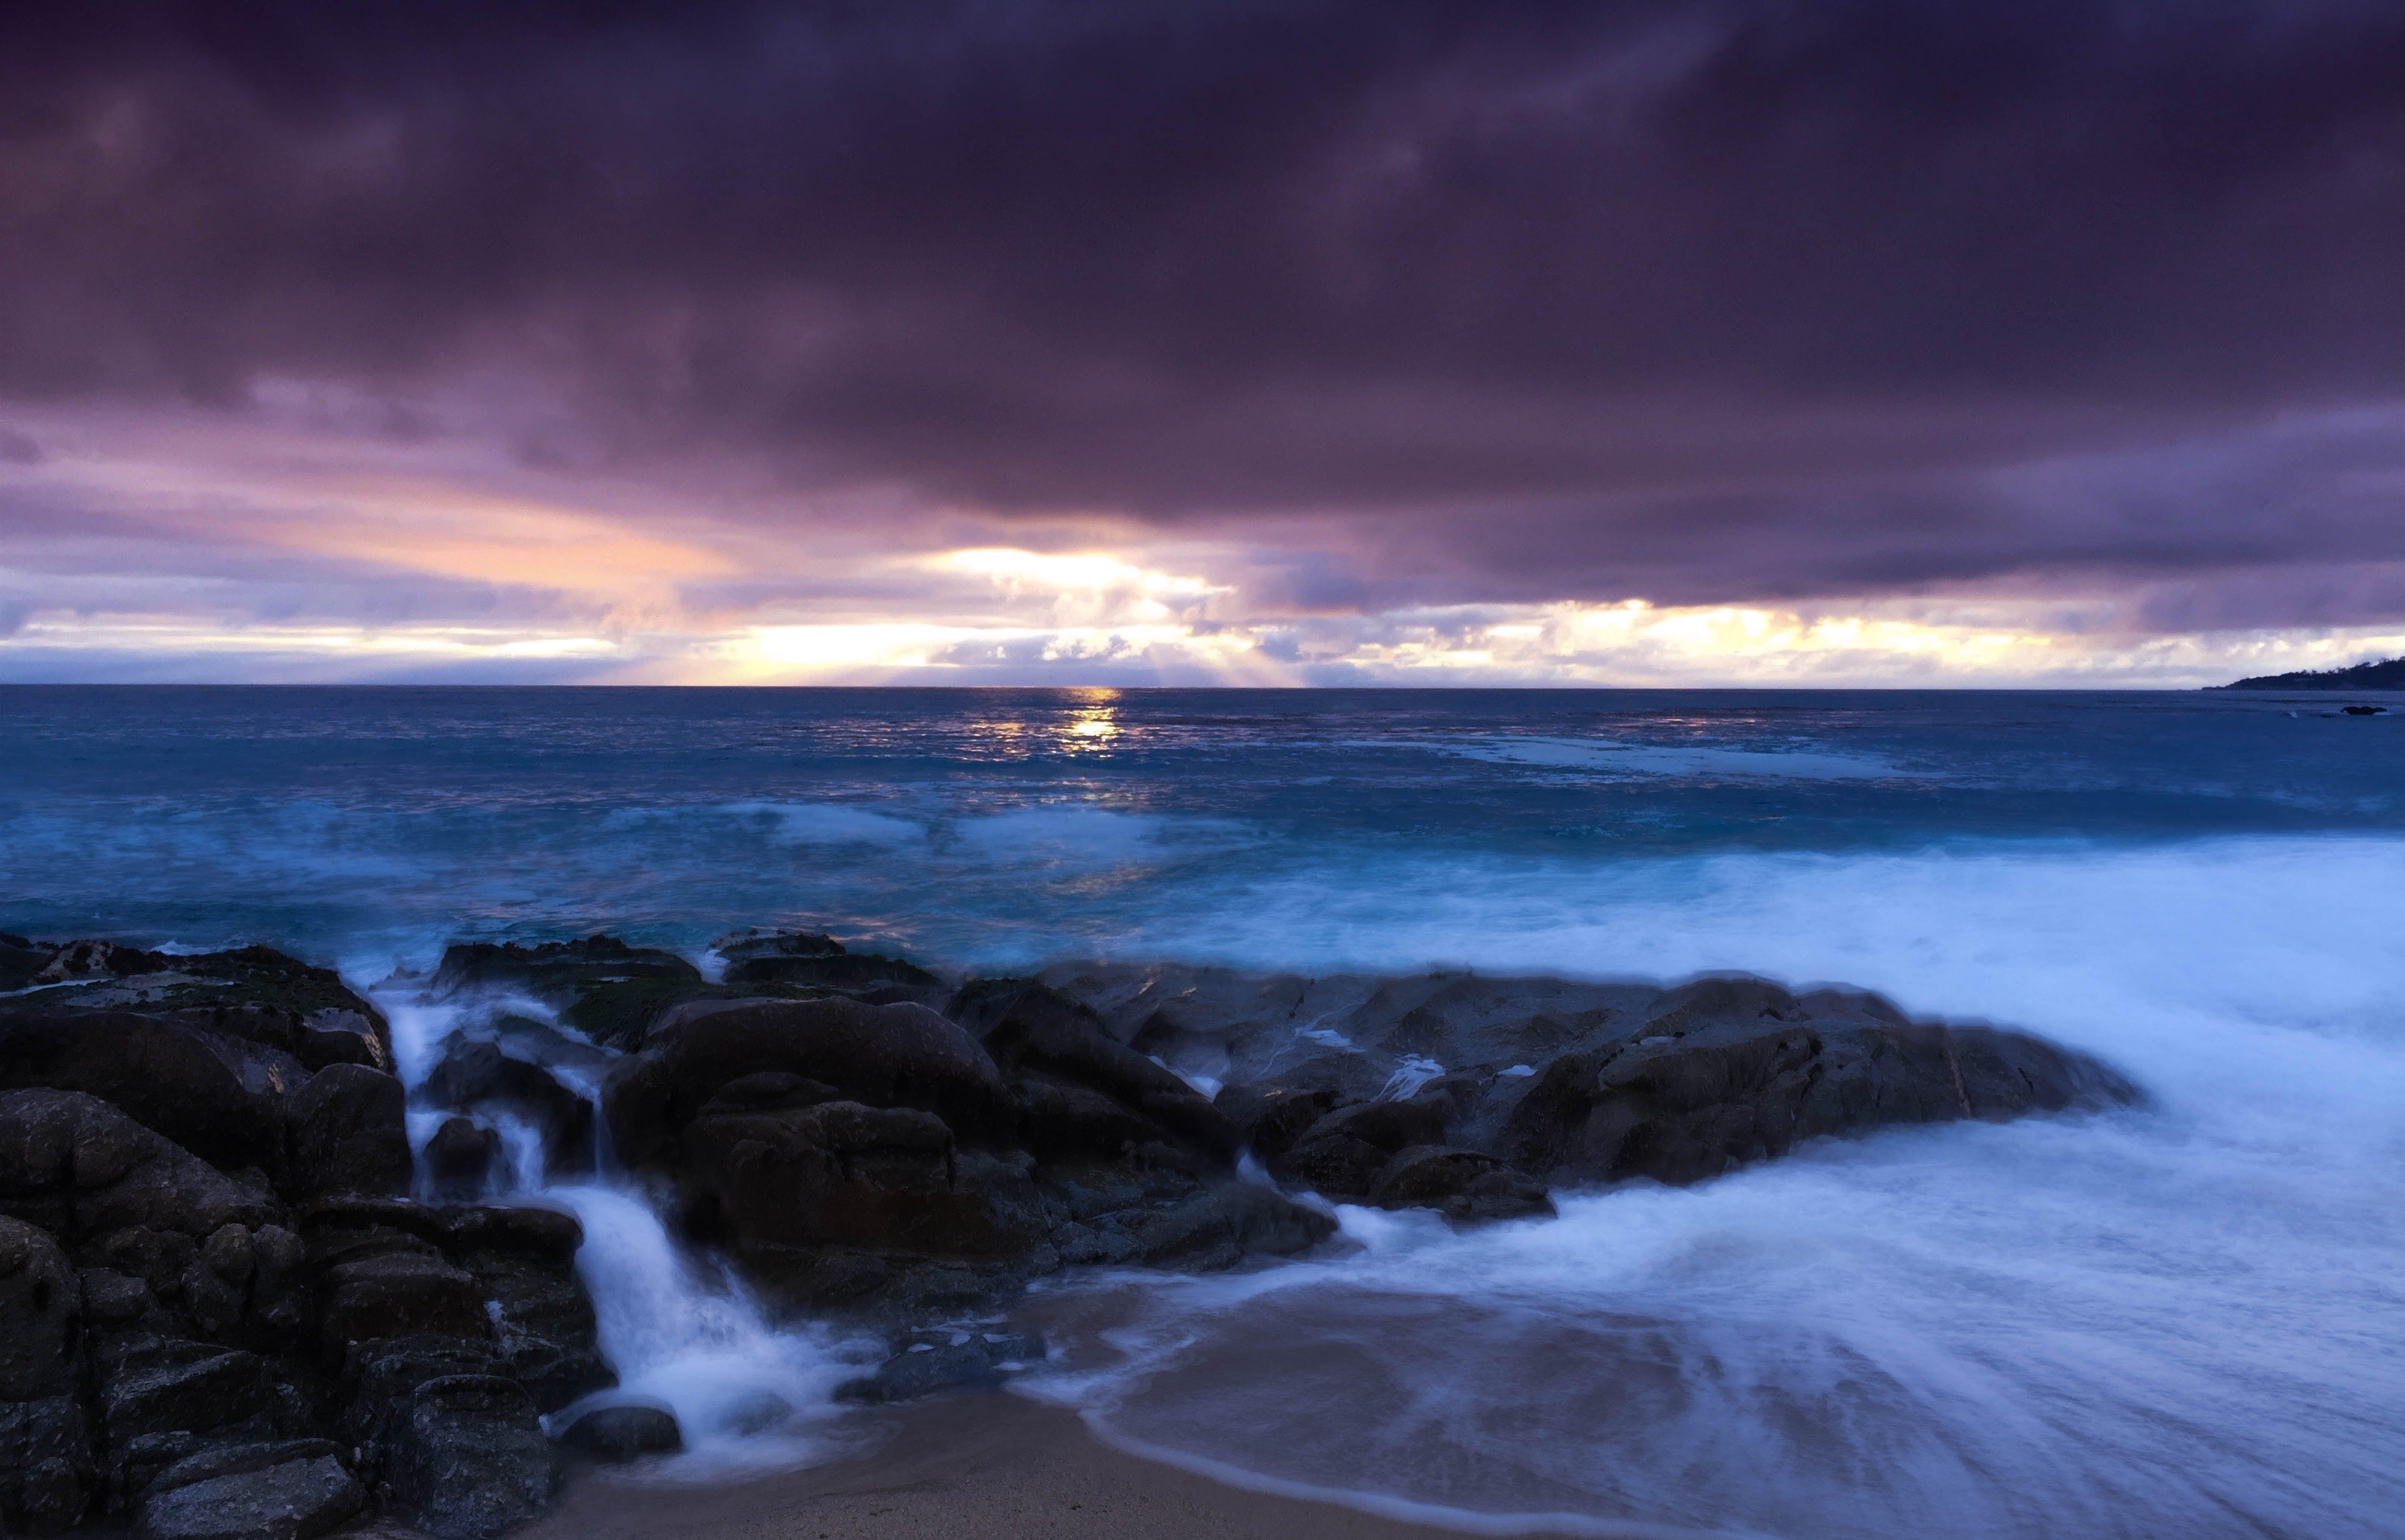 Kostenloses Stock Foto zu felsen, himmel, horizont, meer